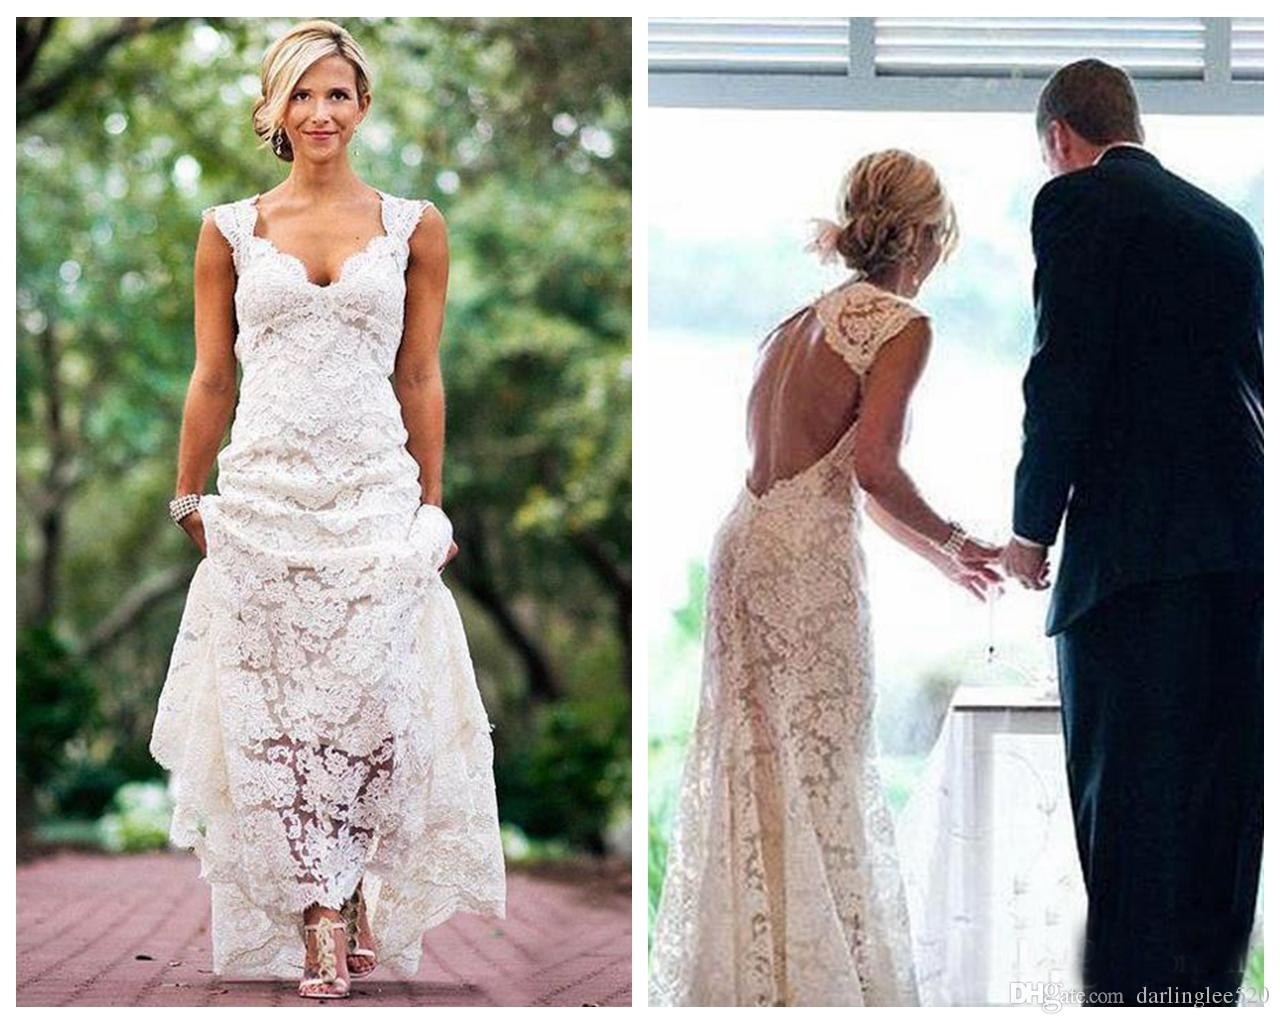 ff88bd52c2d1 Sheath Wedding Dress V Neck Keyhole Back Cap Sleeve Floor Length Illusion  Vestidos De Noiva Bridal Dress 2018 White Simple Wedding Gowns Simple  Wedding ...